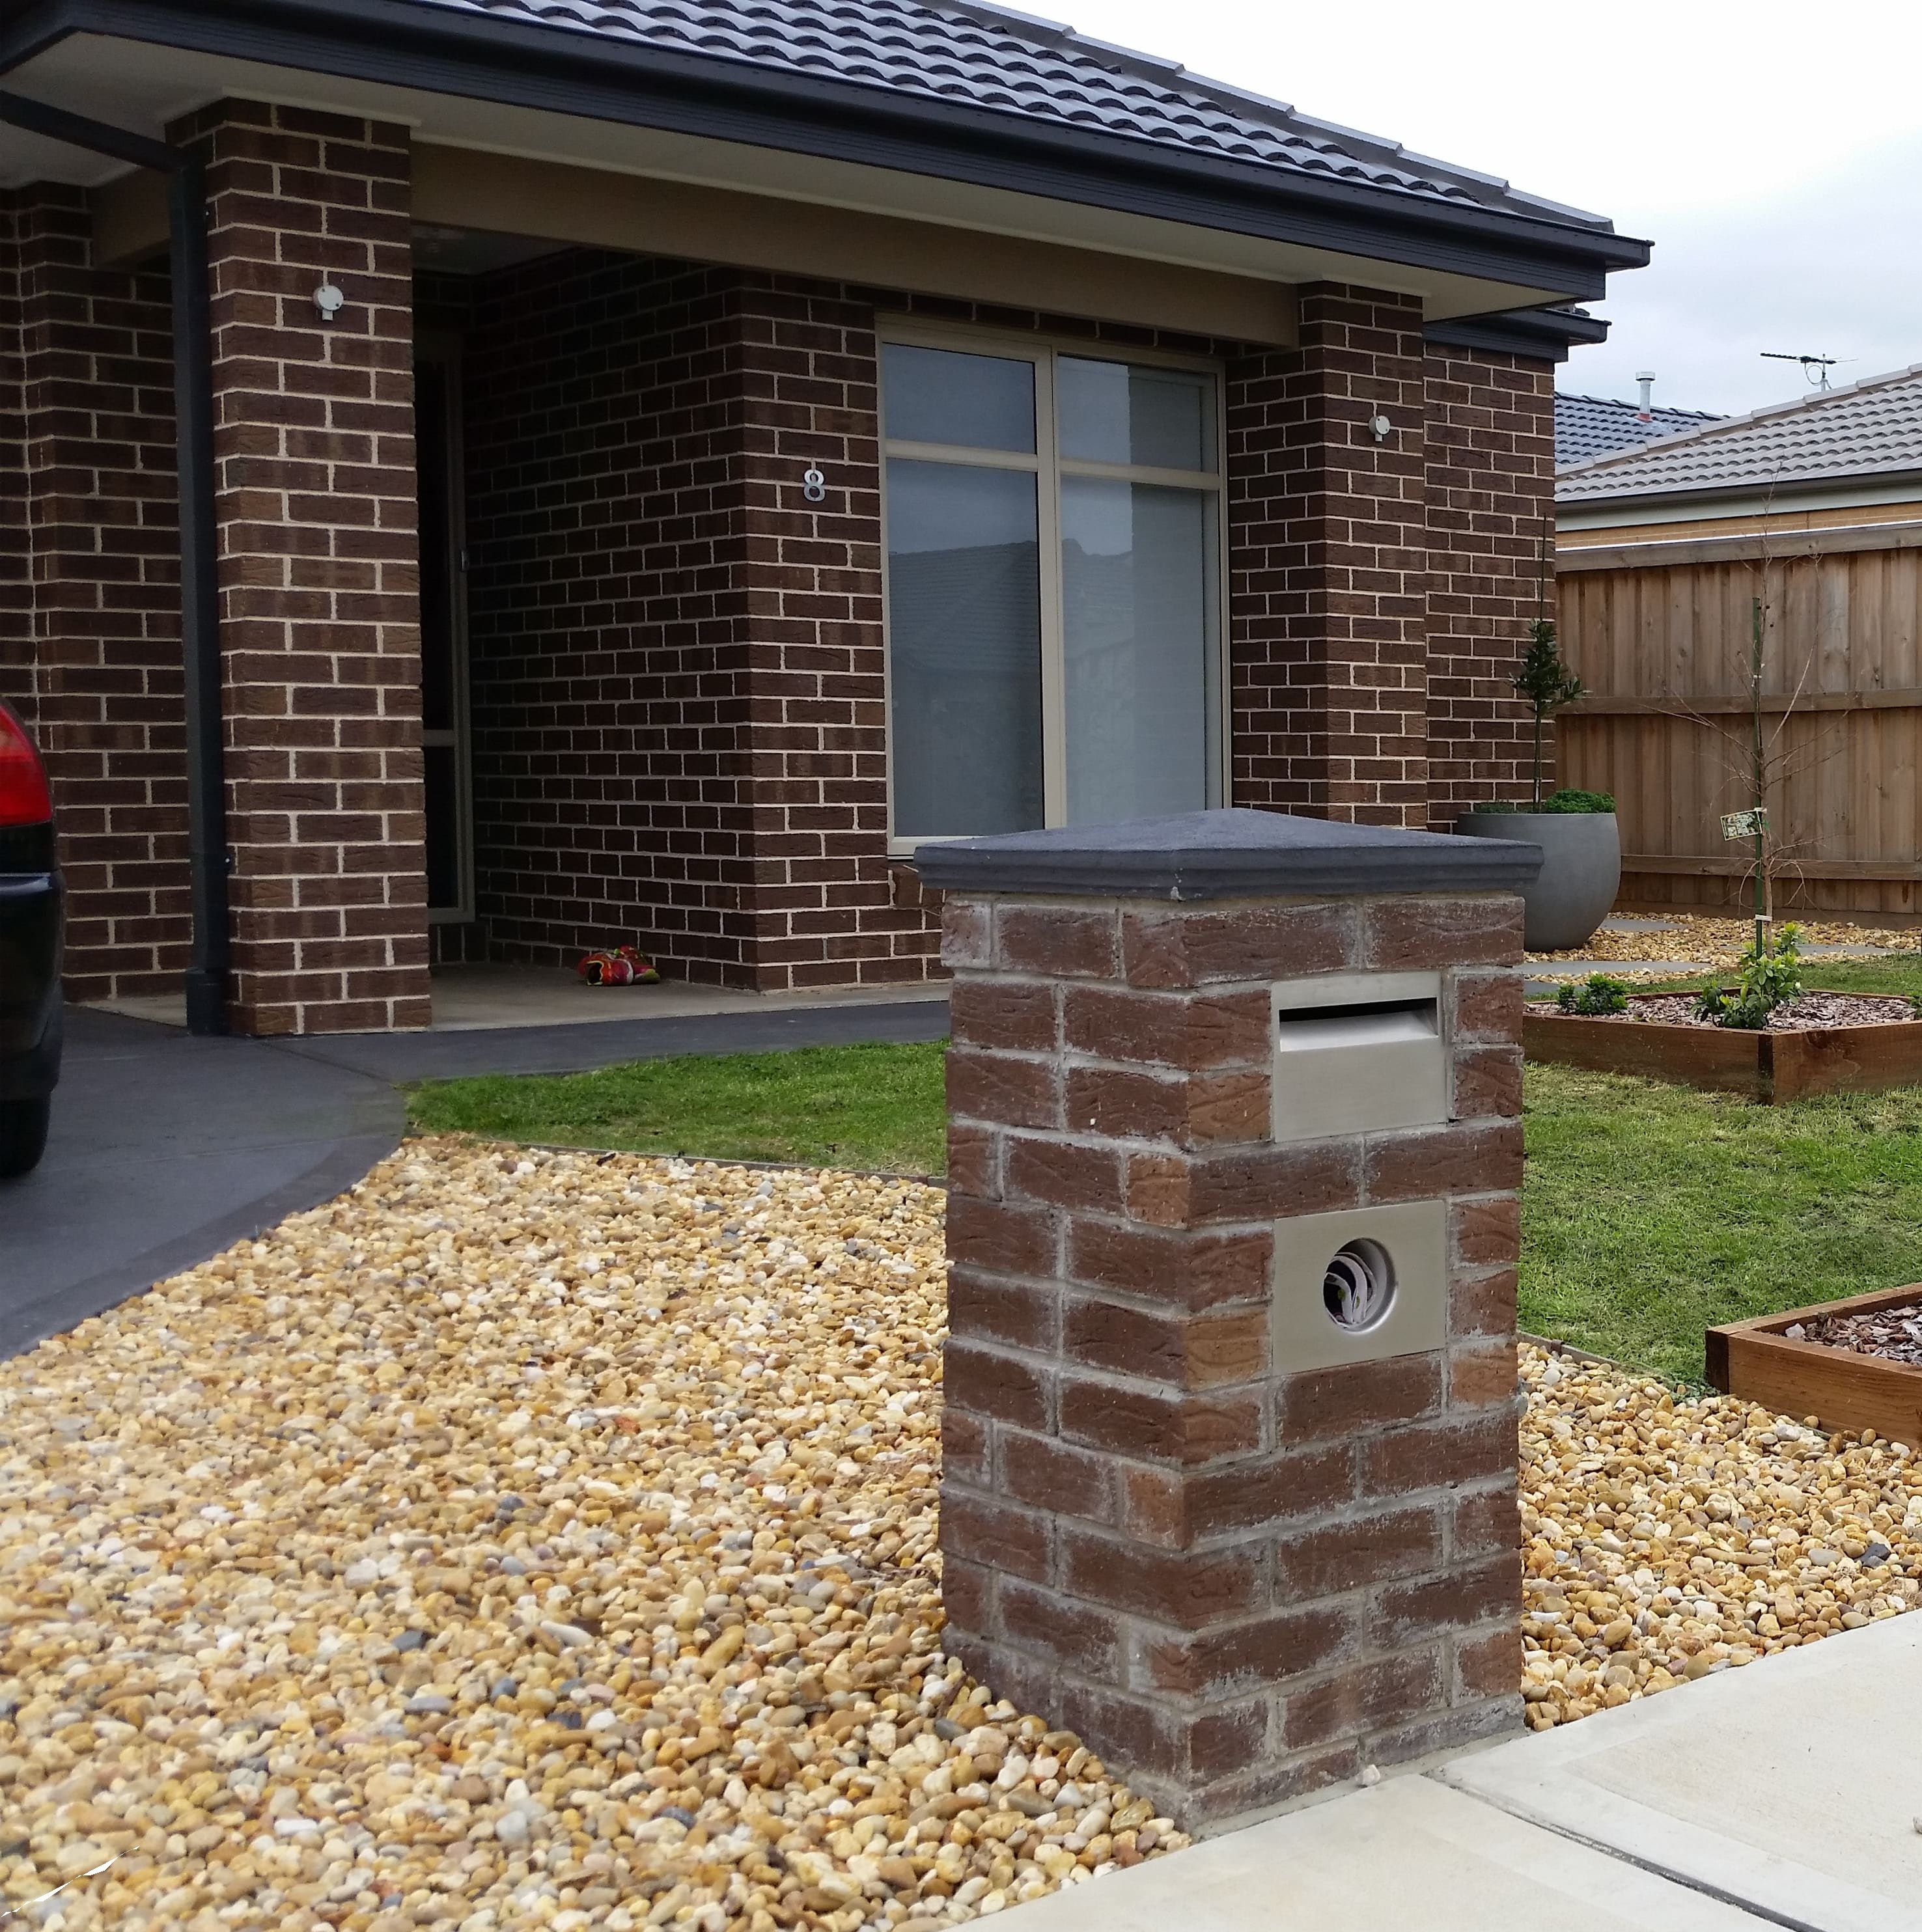 Garage Door Landscaping Ideas: Mail Box Ideas In 2019